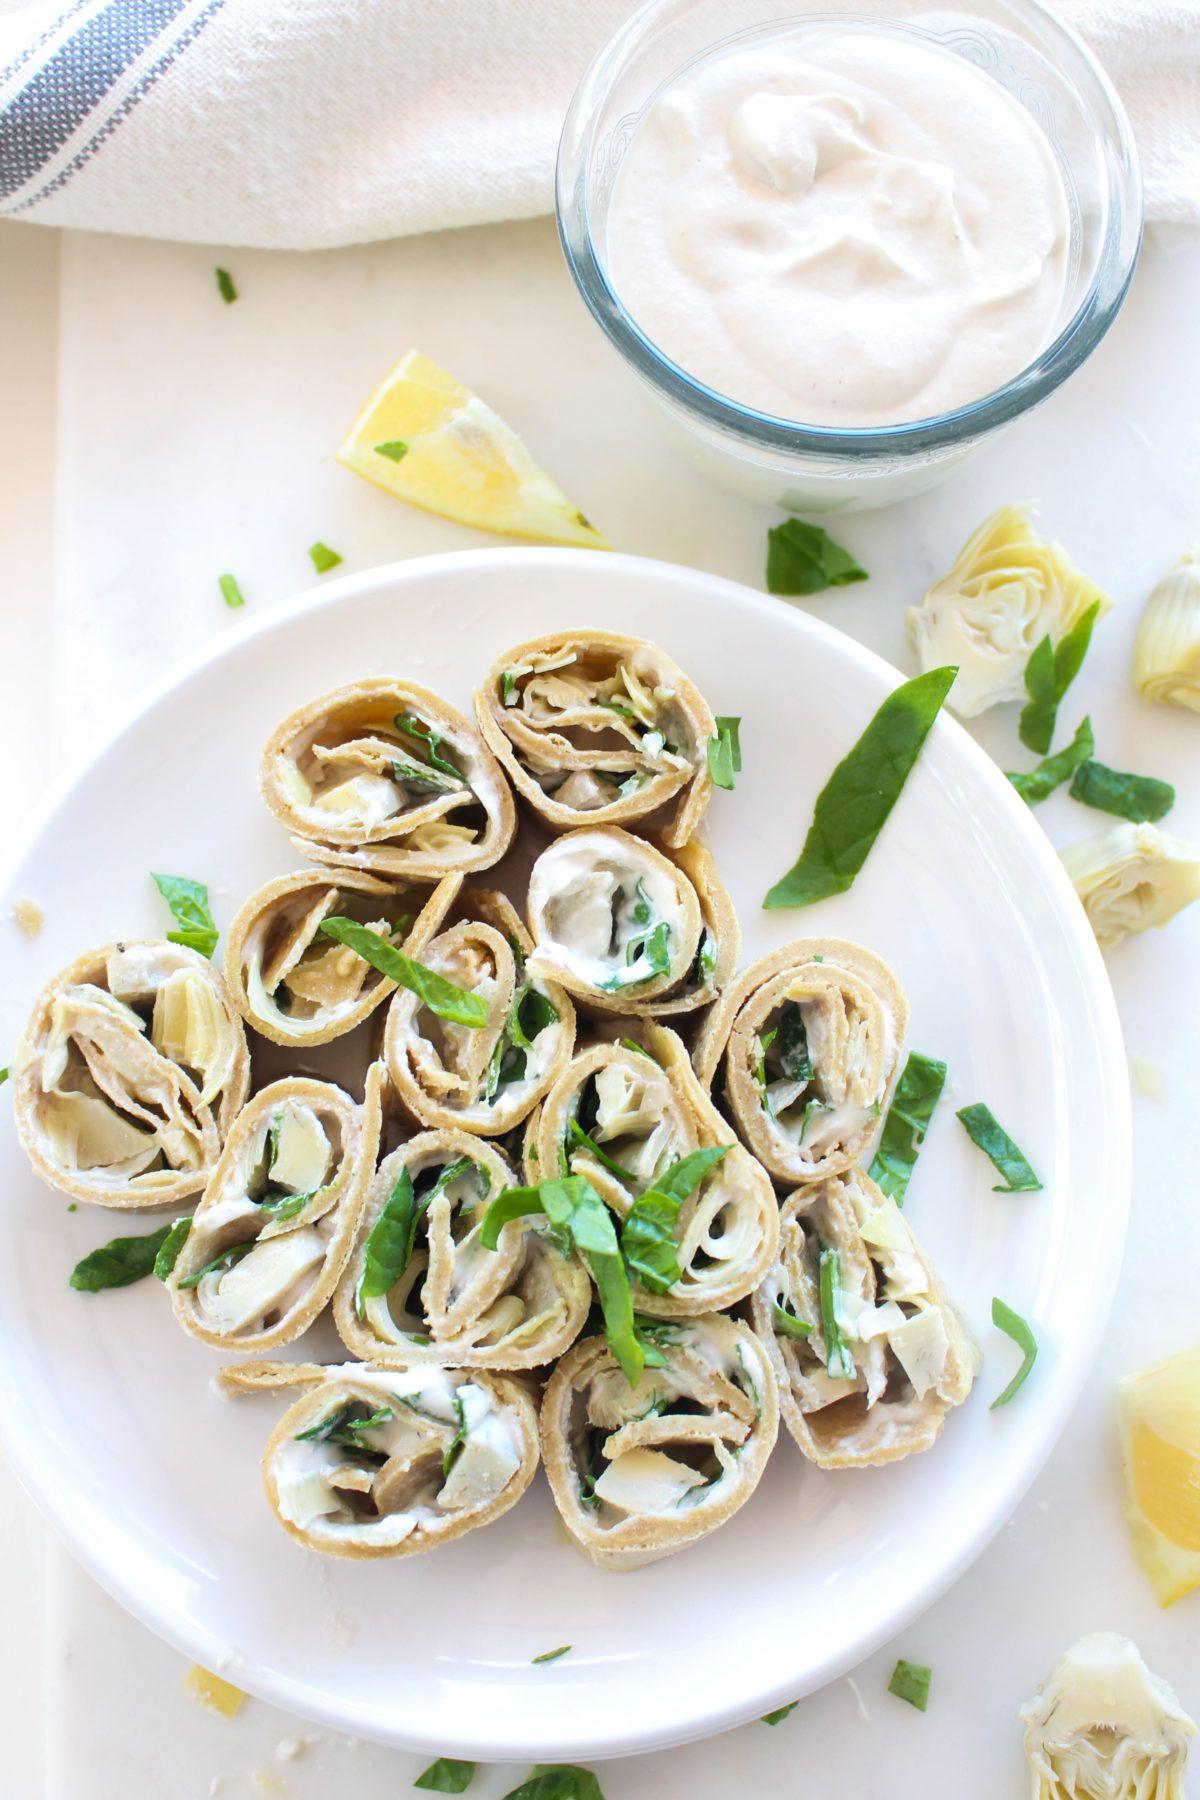 Spinach artichoke pinwheels